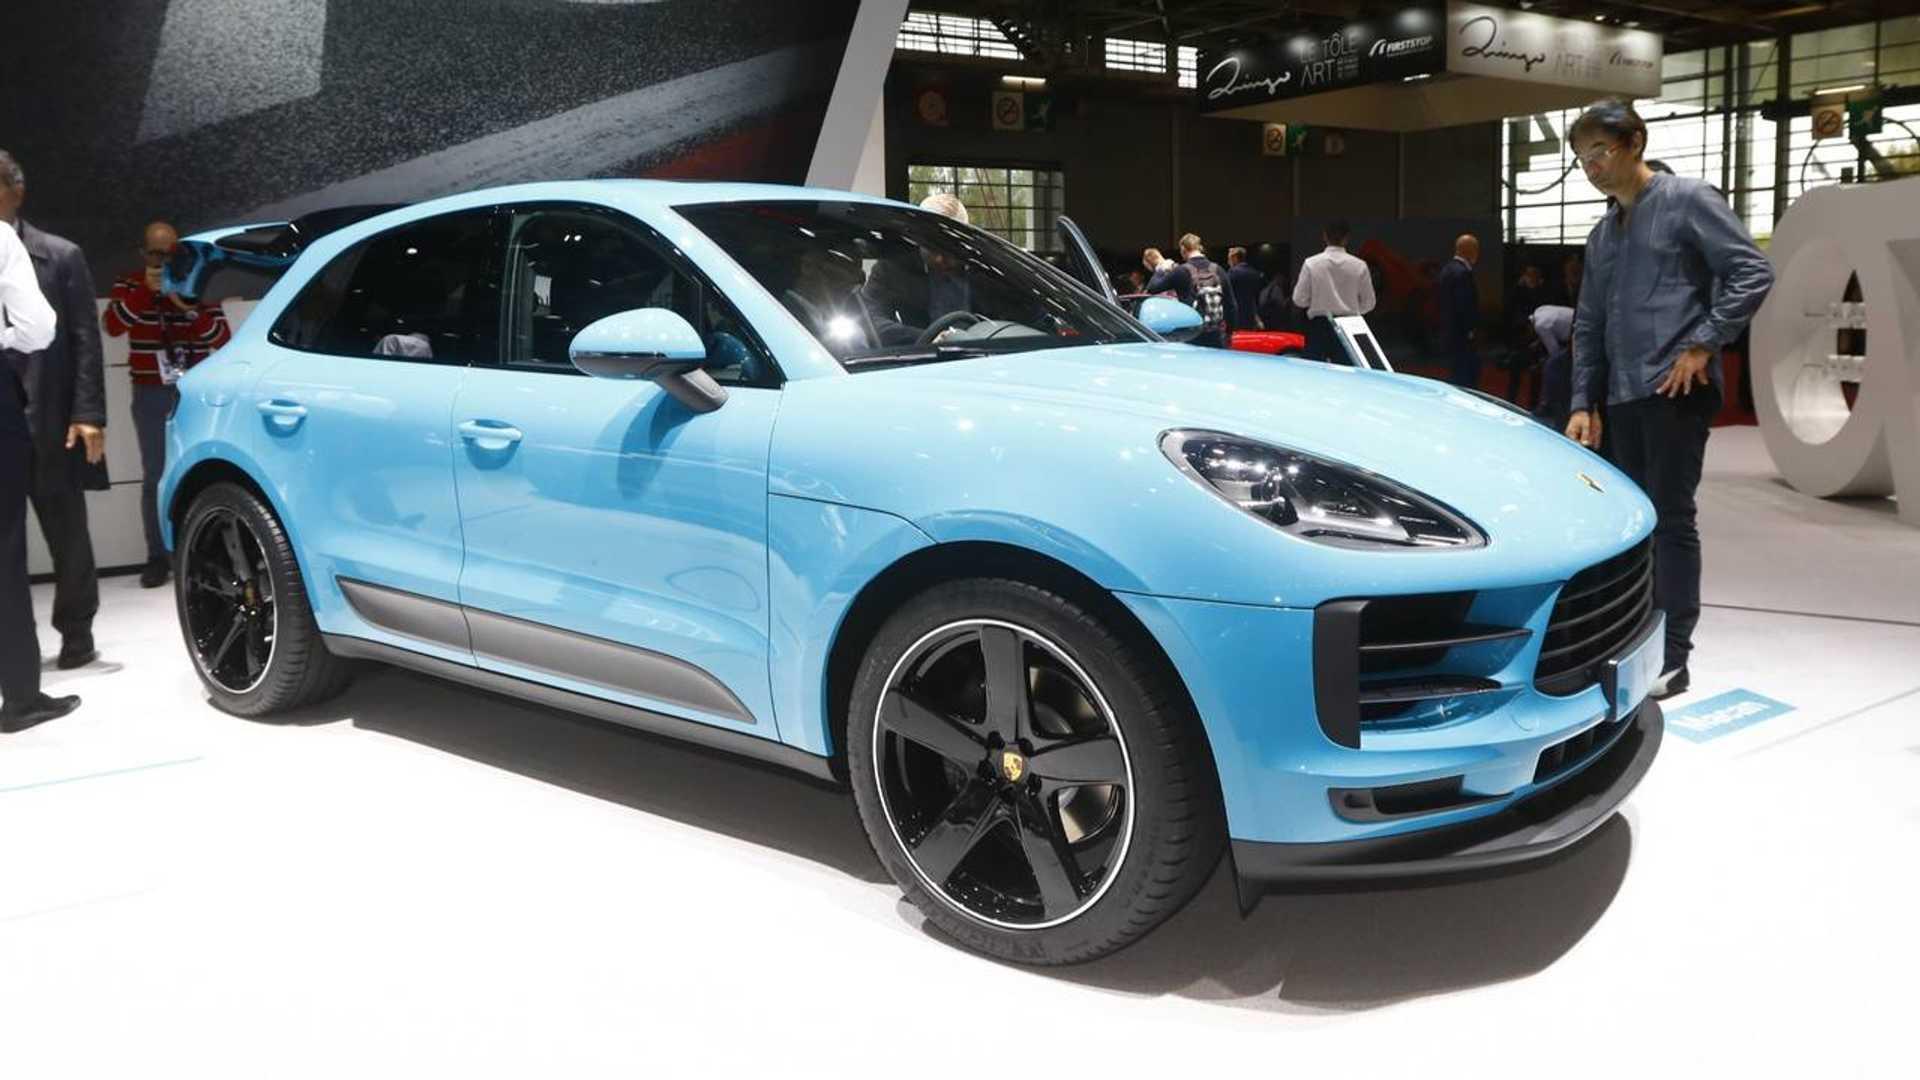 2021 Porsche Macan Redesign Turbo Gts And Specs >> 2019 Porsche Macan Arrives In Paris With 2 0 Liter Turbo Engine